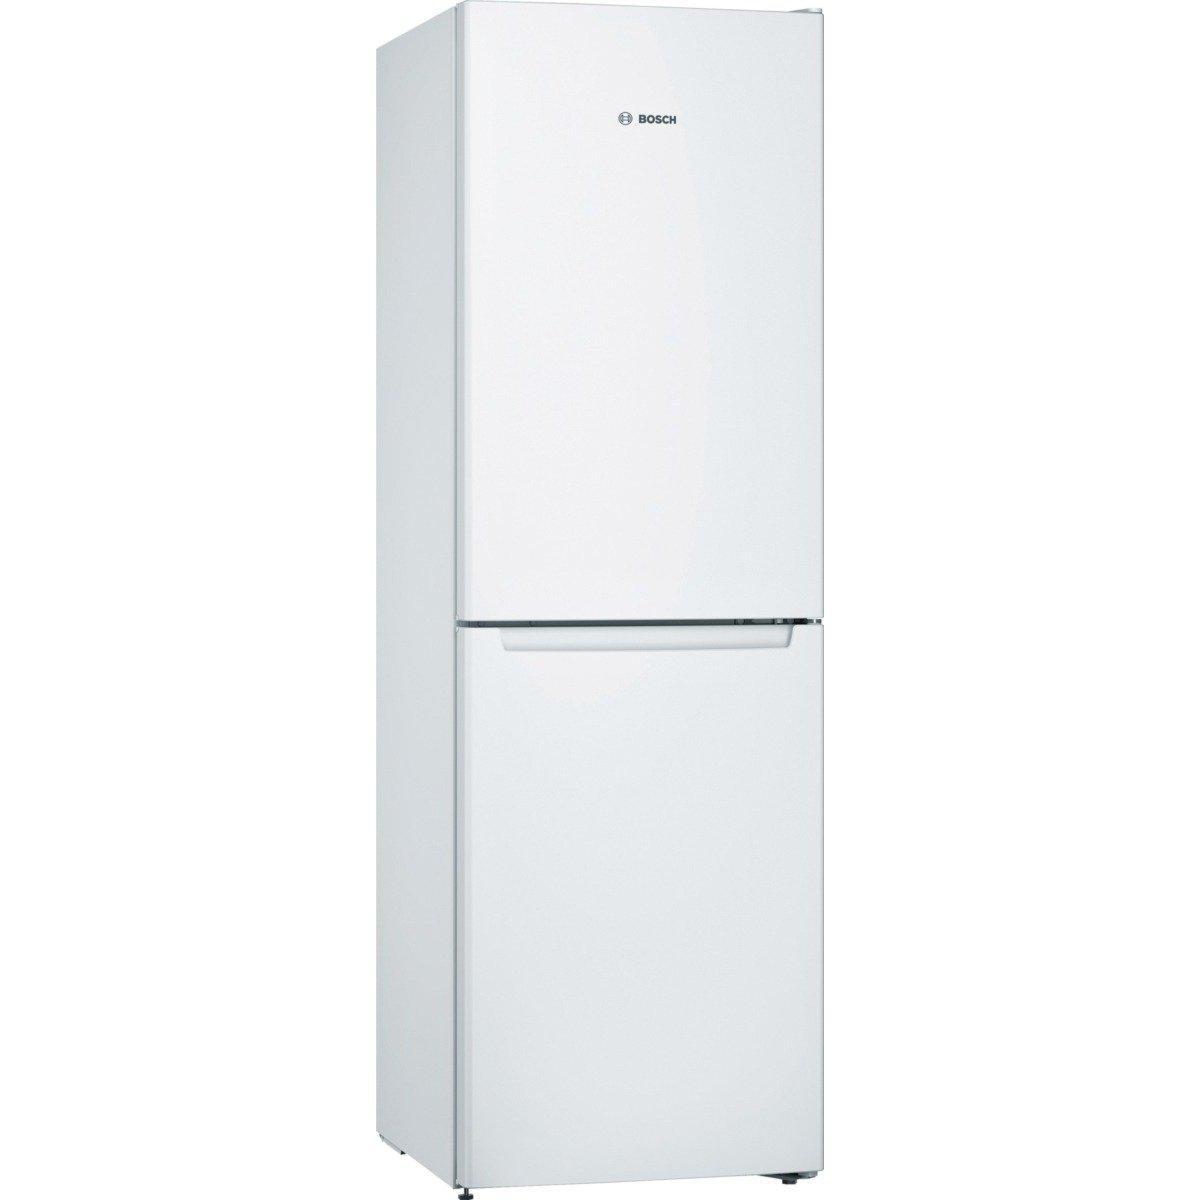 fridge freezers refrigeration catalogue euronics site rh euronics co uk Beko Fridge Freezer Beko American Fridge Freezer